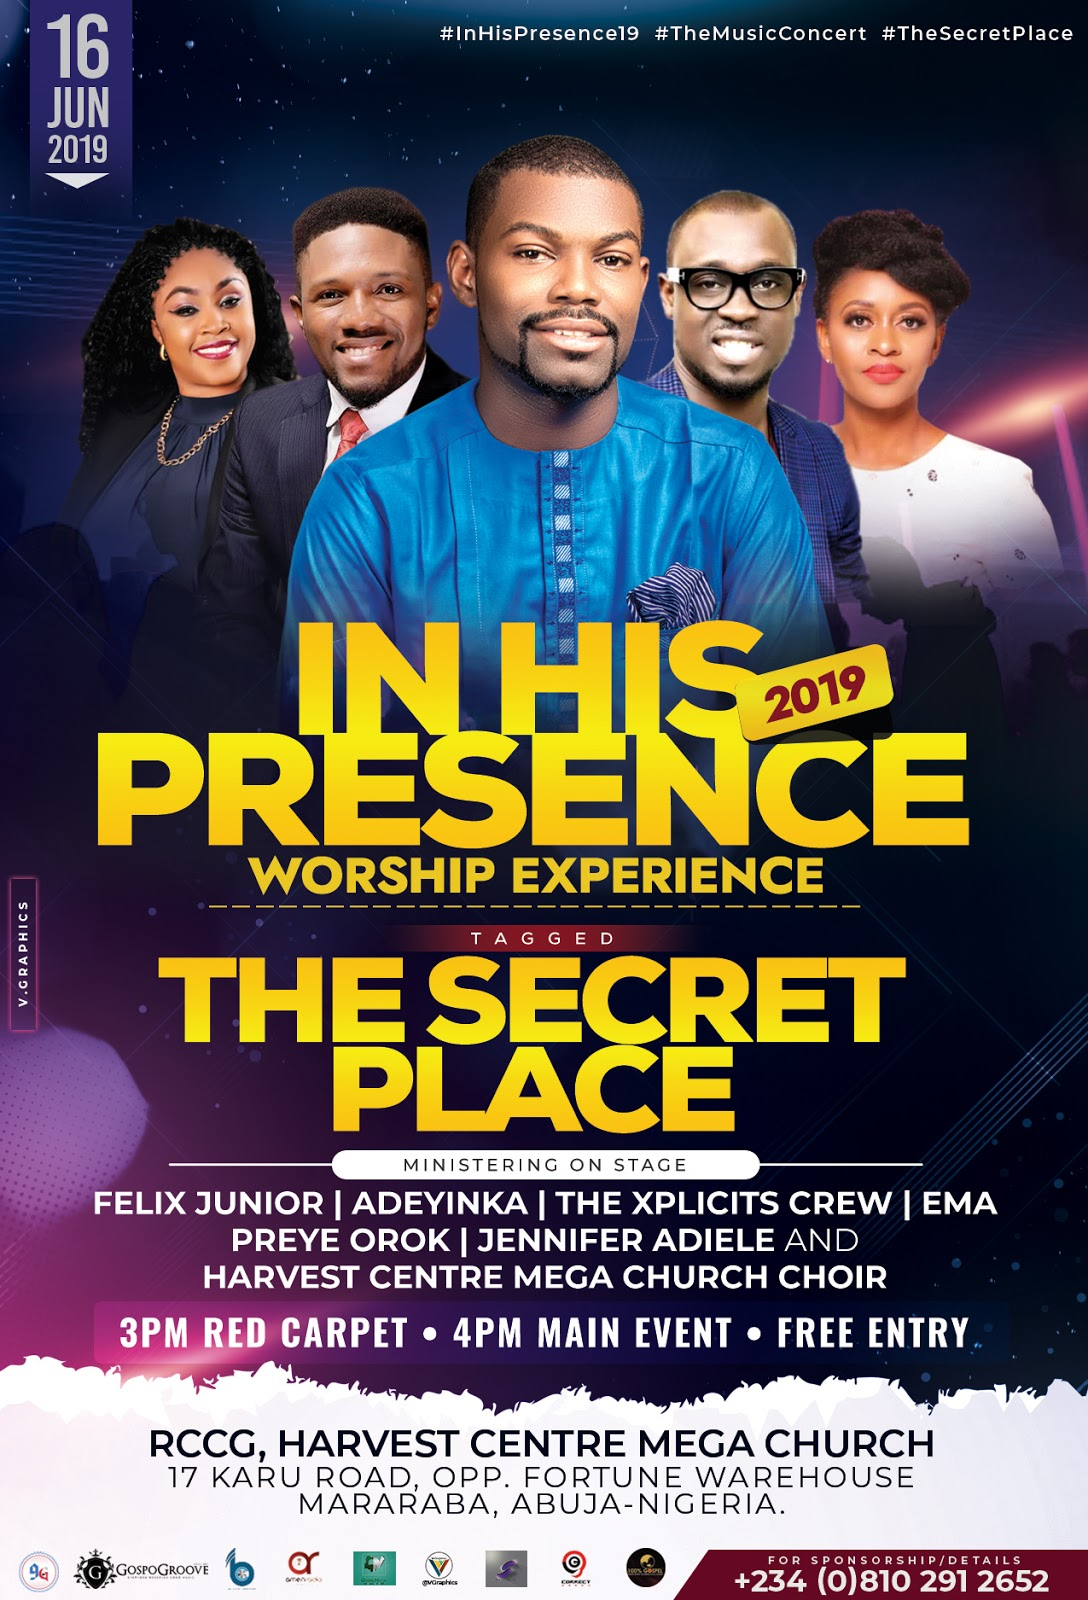 Event: Felix Junior, Preye Orok, Ema & Jennifer Adiele To Headline In His Presence Worship Experience 2019 || @iamfelix_junior